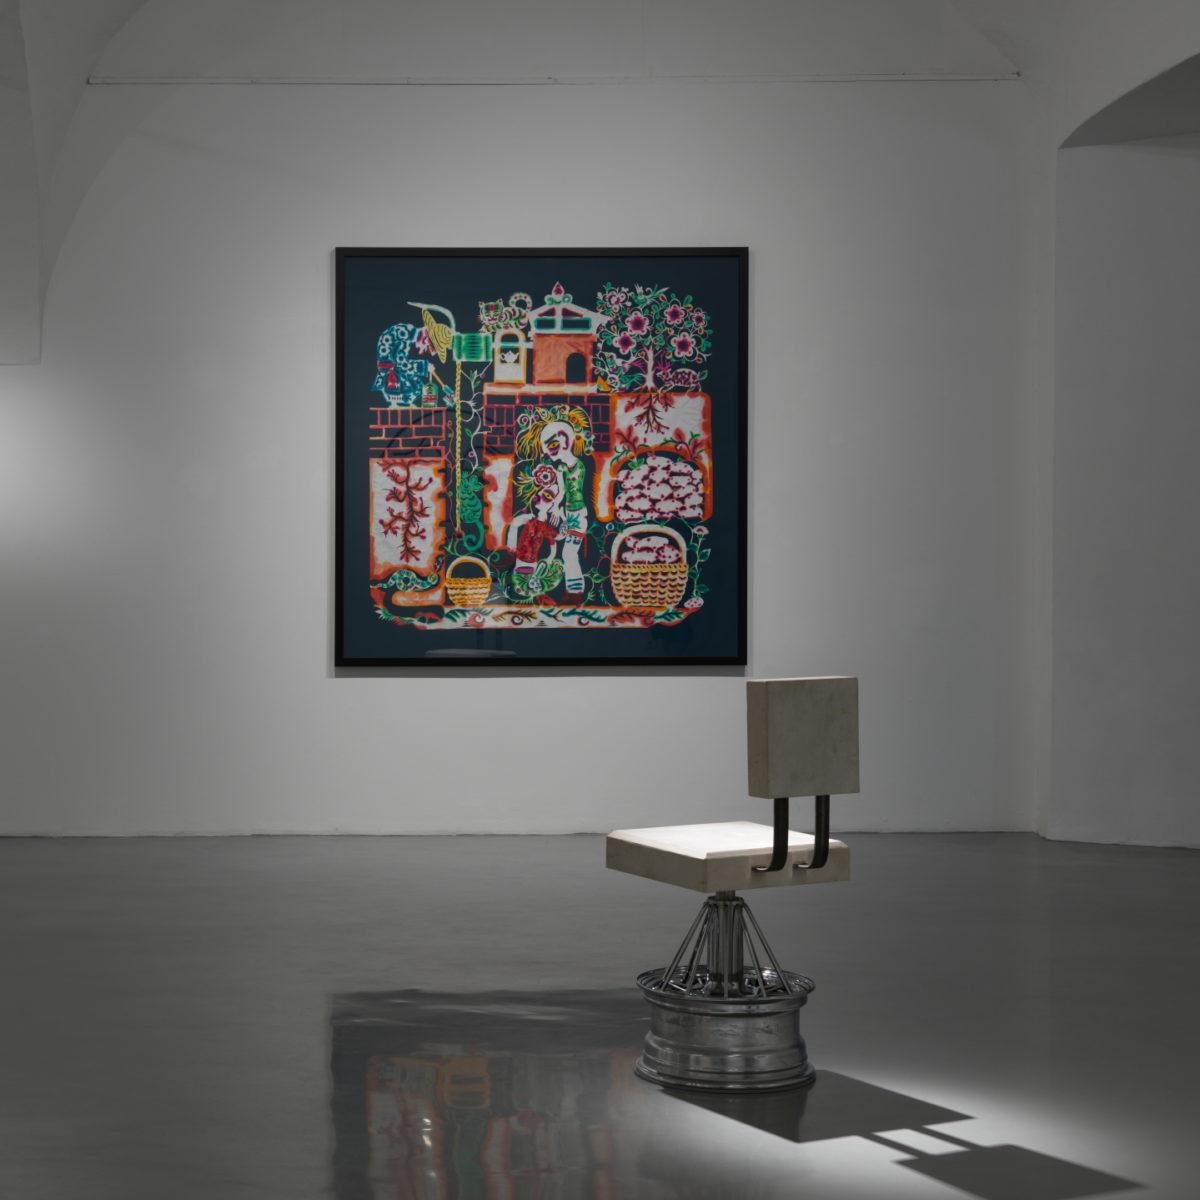 XIYADIE, Papierschnitt, 2019; Dozie Kanu, Chair, 2019. Foto Jaka Babnik, 33. Graphik Biennale Ljubljana